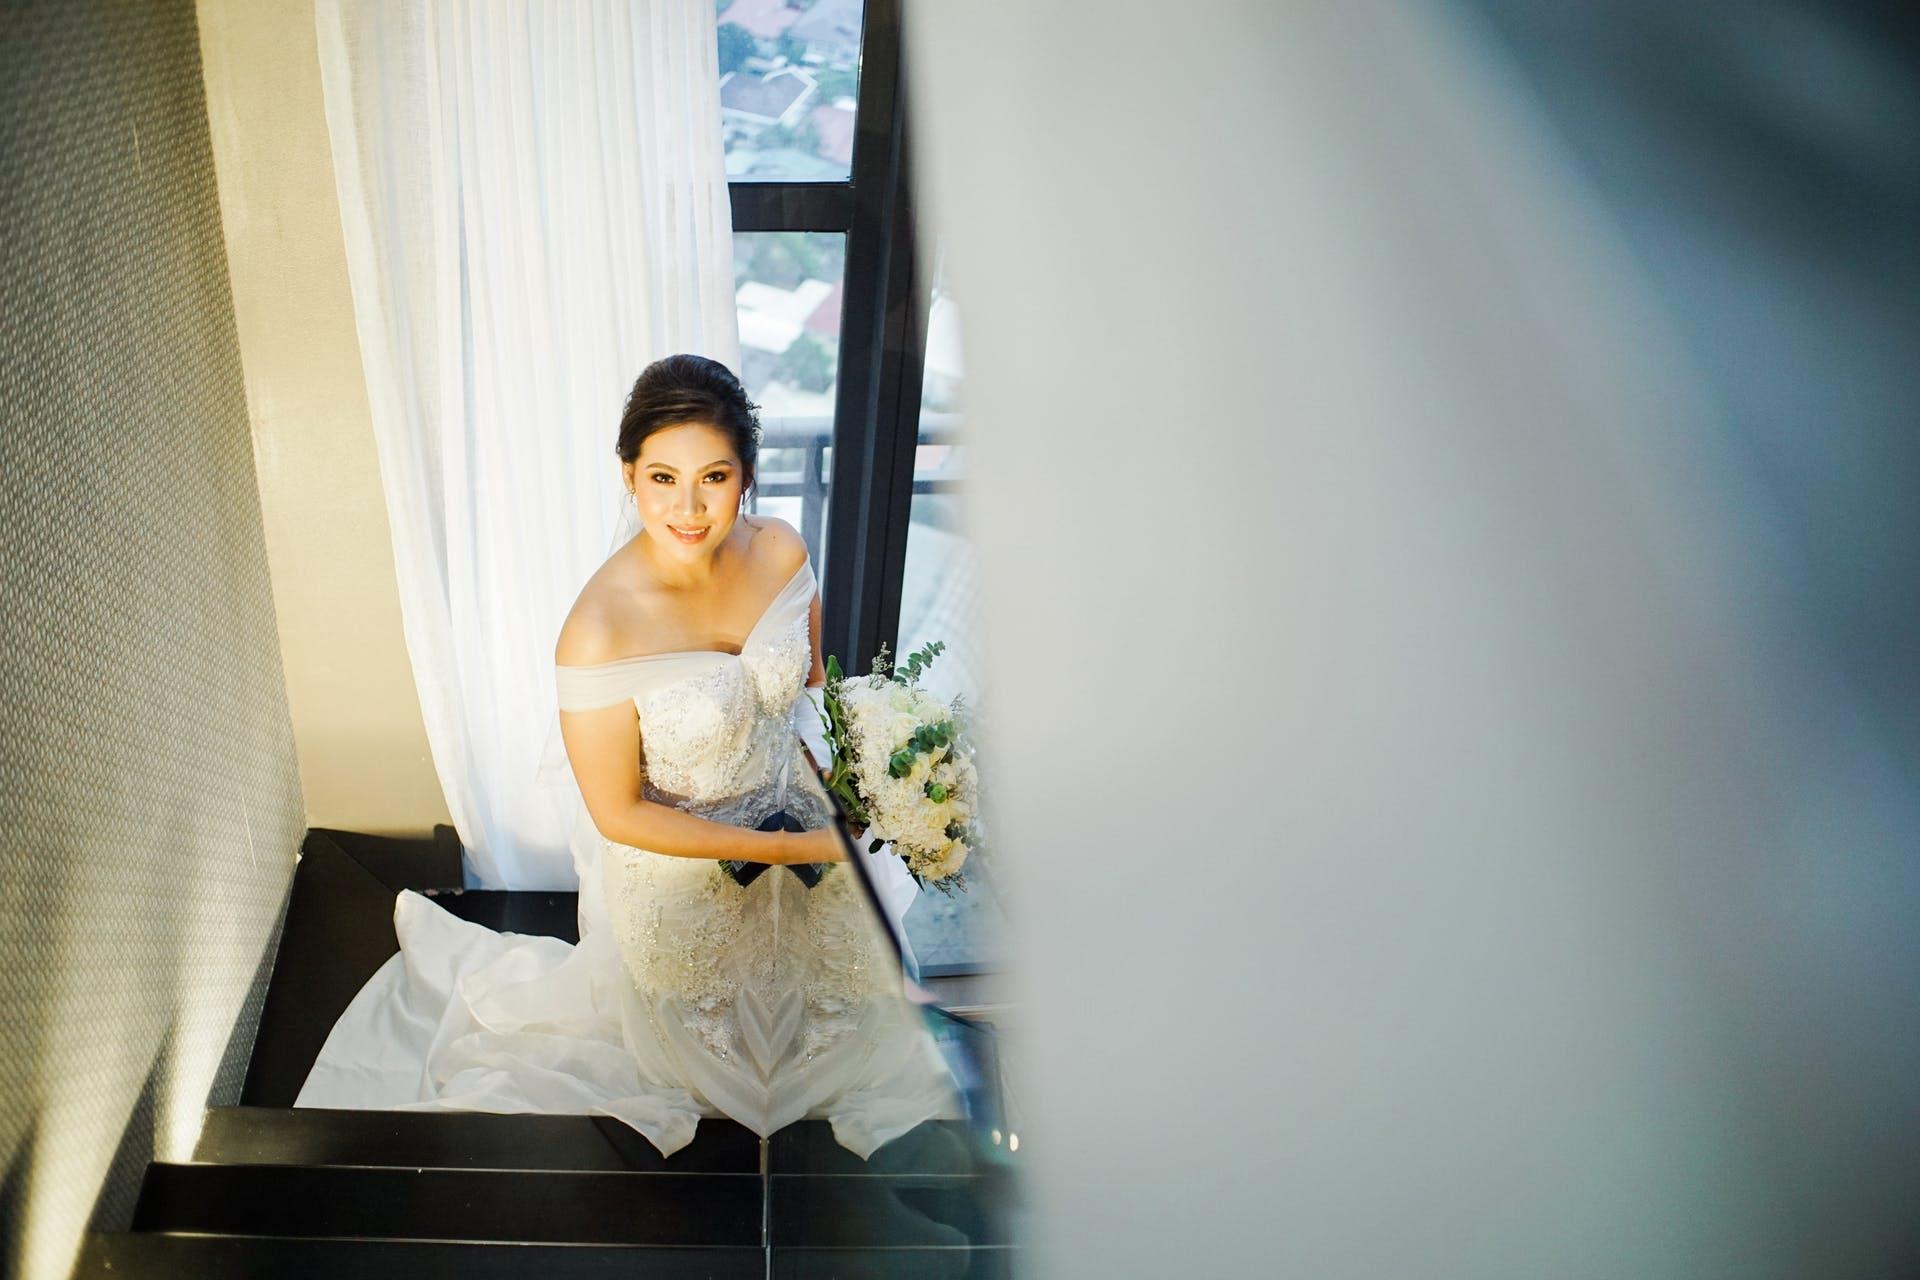 Wedding-Dresses-3943